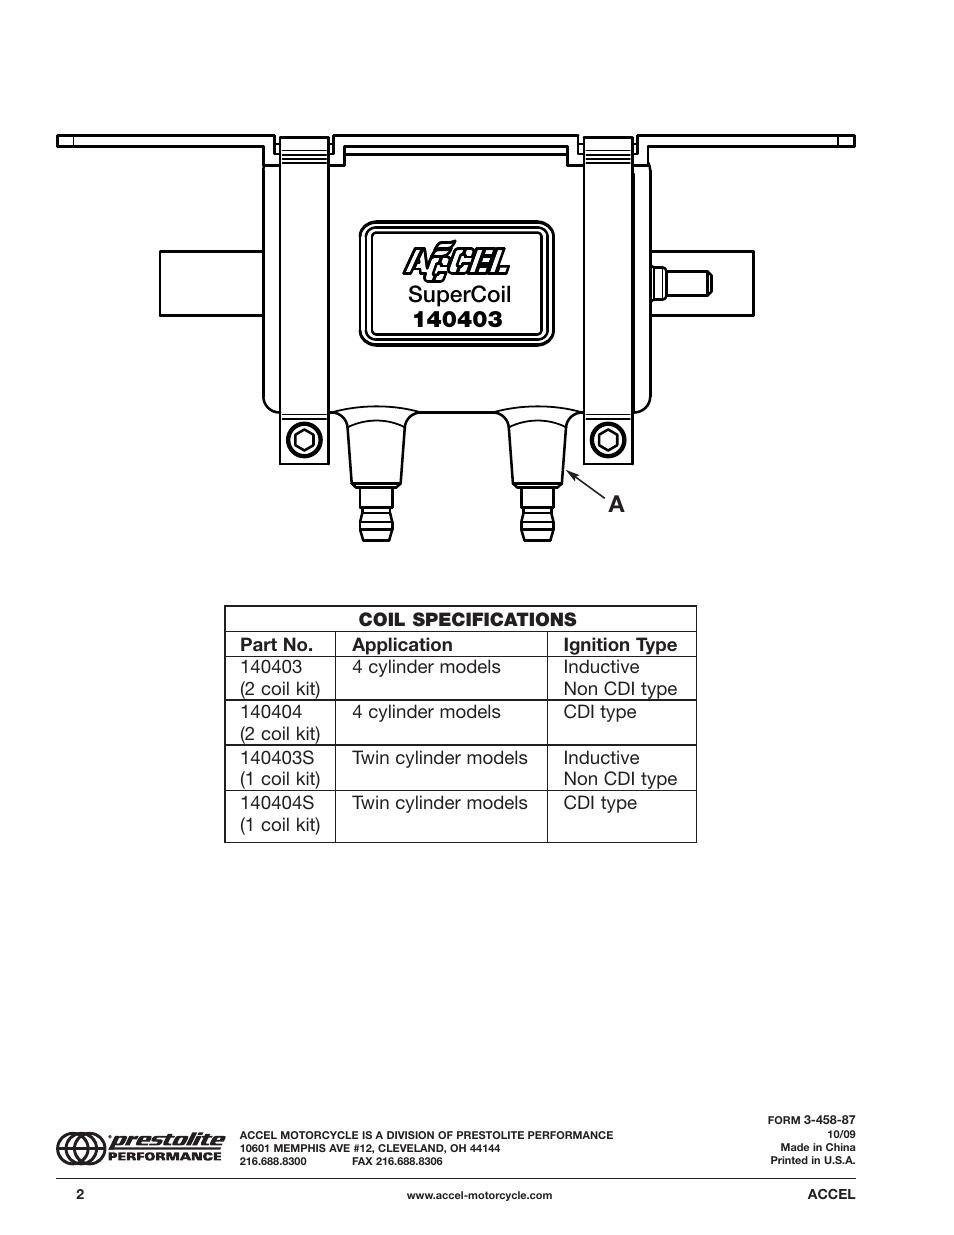 DIAGRAM] Accel Super Coil Wiring Diagram FULL Version HD Quality Wiring  Diagram - CHAKRADIAGRAM.PATINAGE-ANGERS.FRchakradiagram.patinage-angers.fr